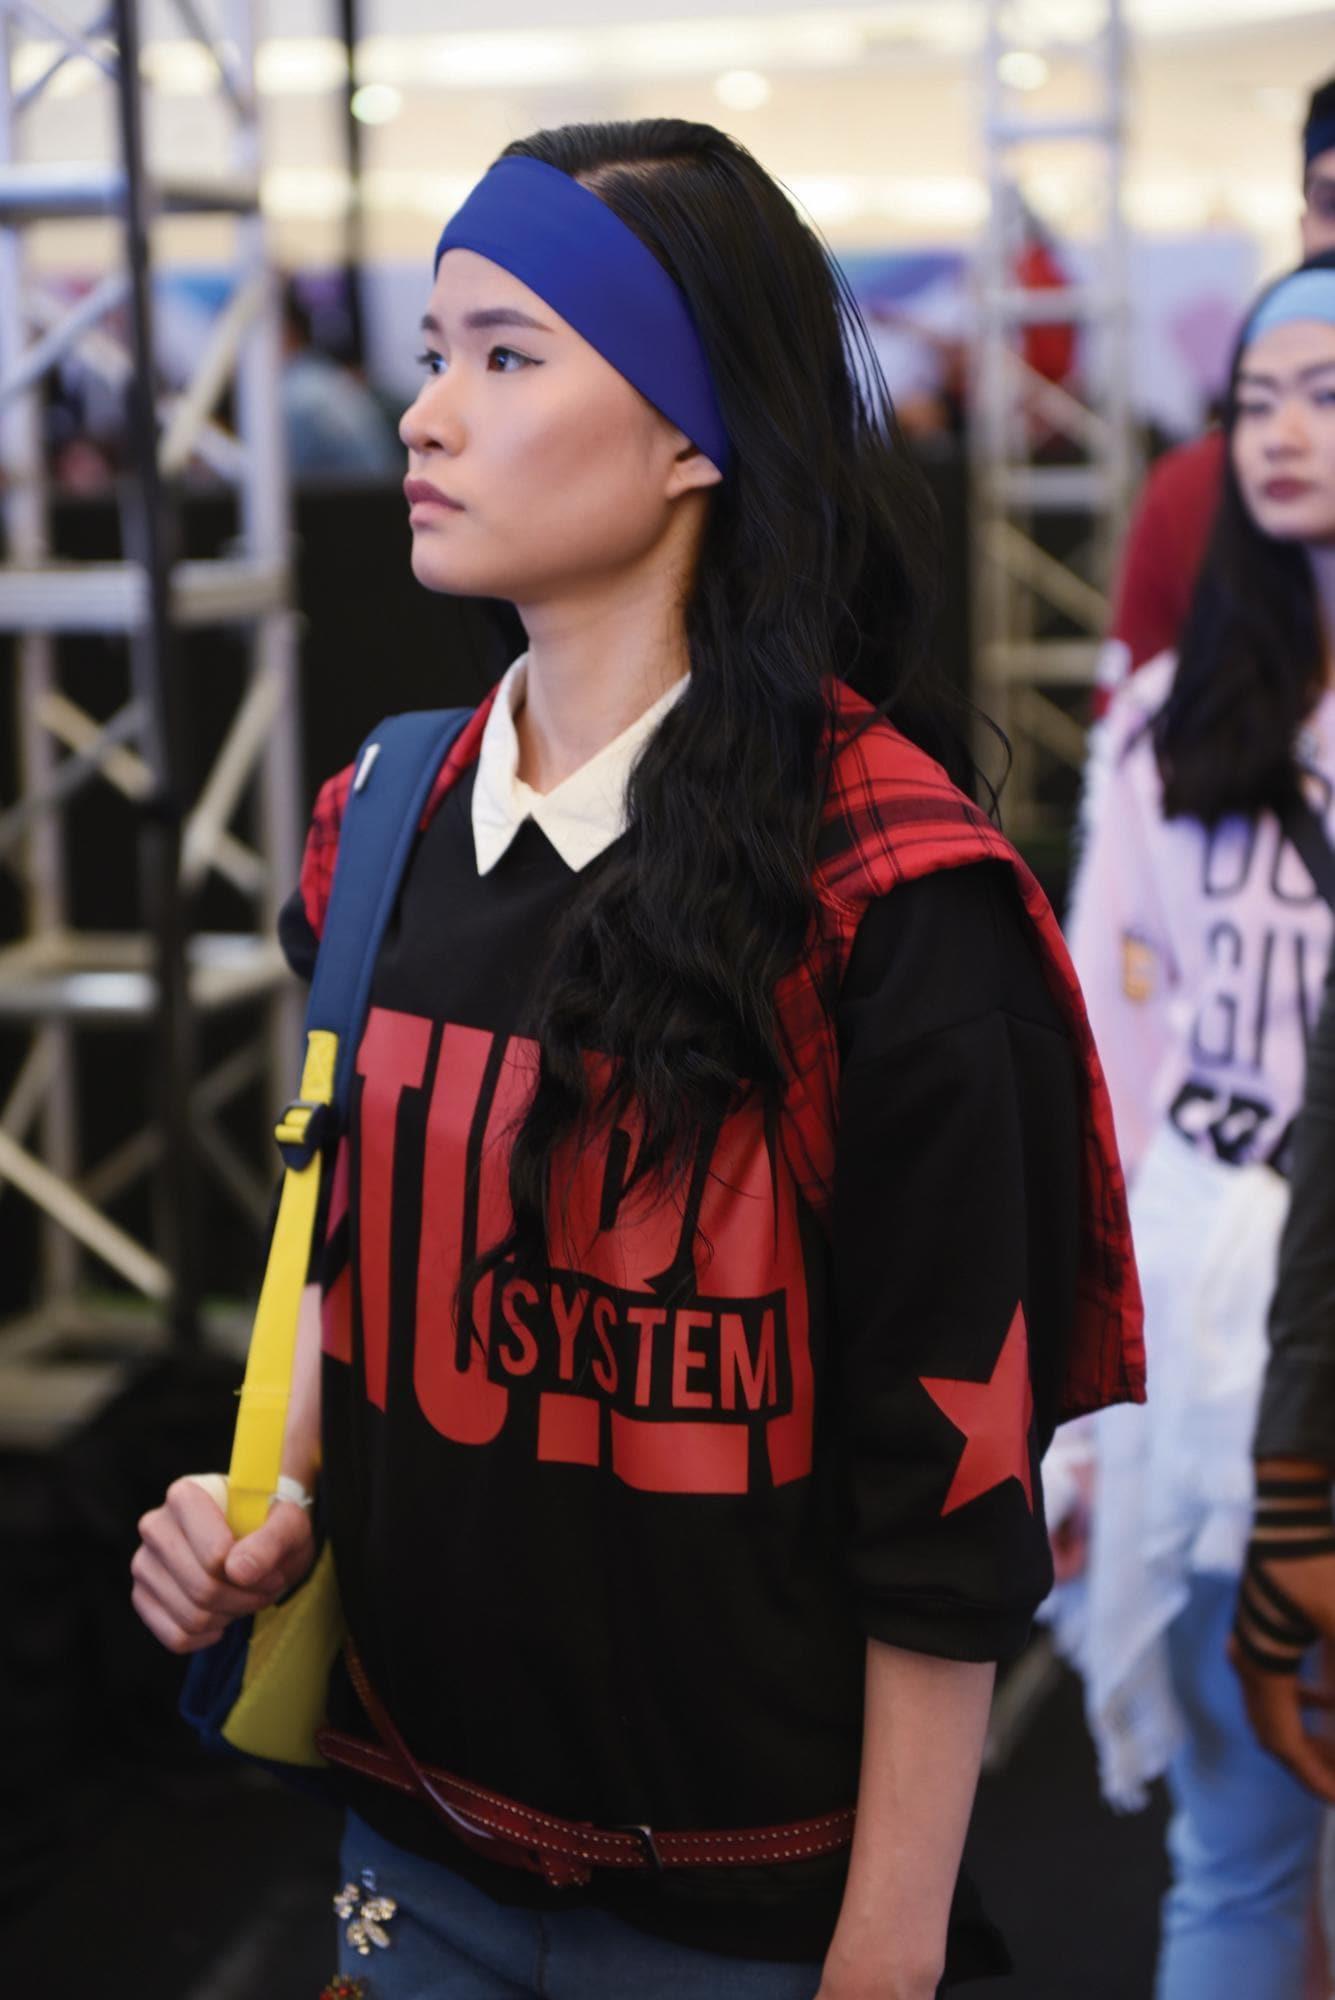 Wanita asia dengan rambut hitam panjang menggunakan kaus hitam dan headband biru – Jakarta Fashion week 2019